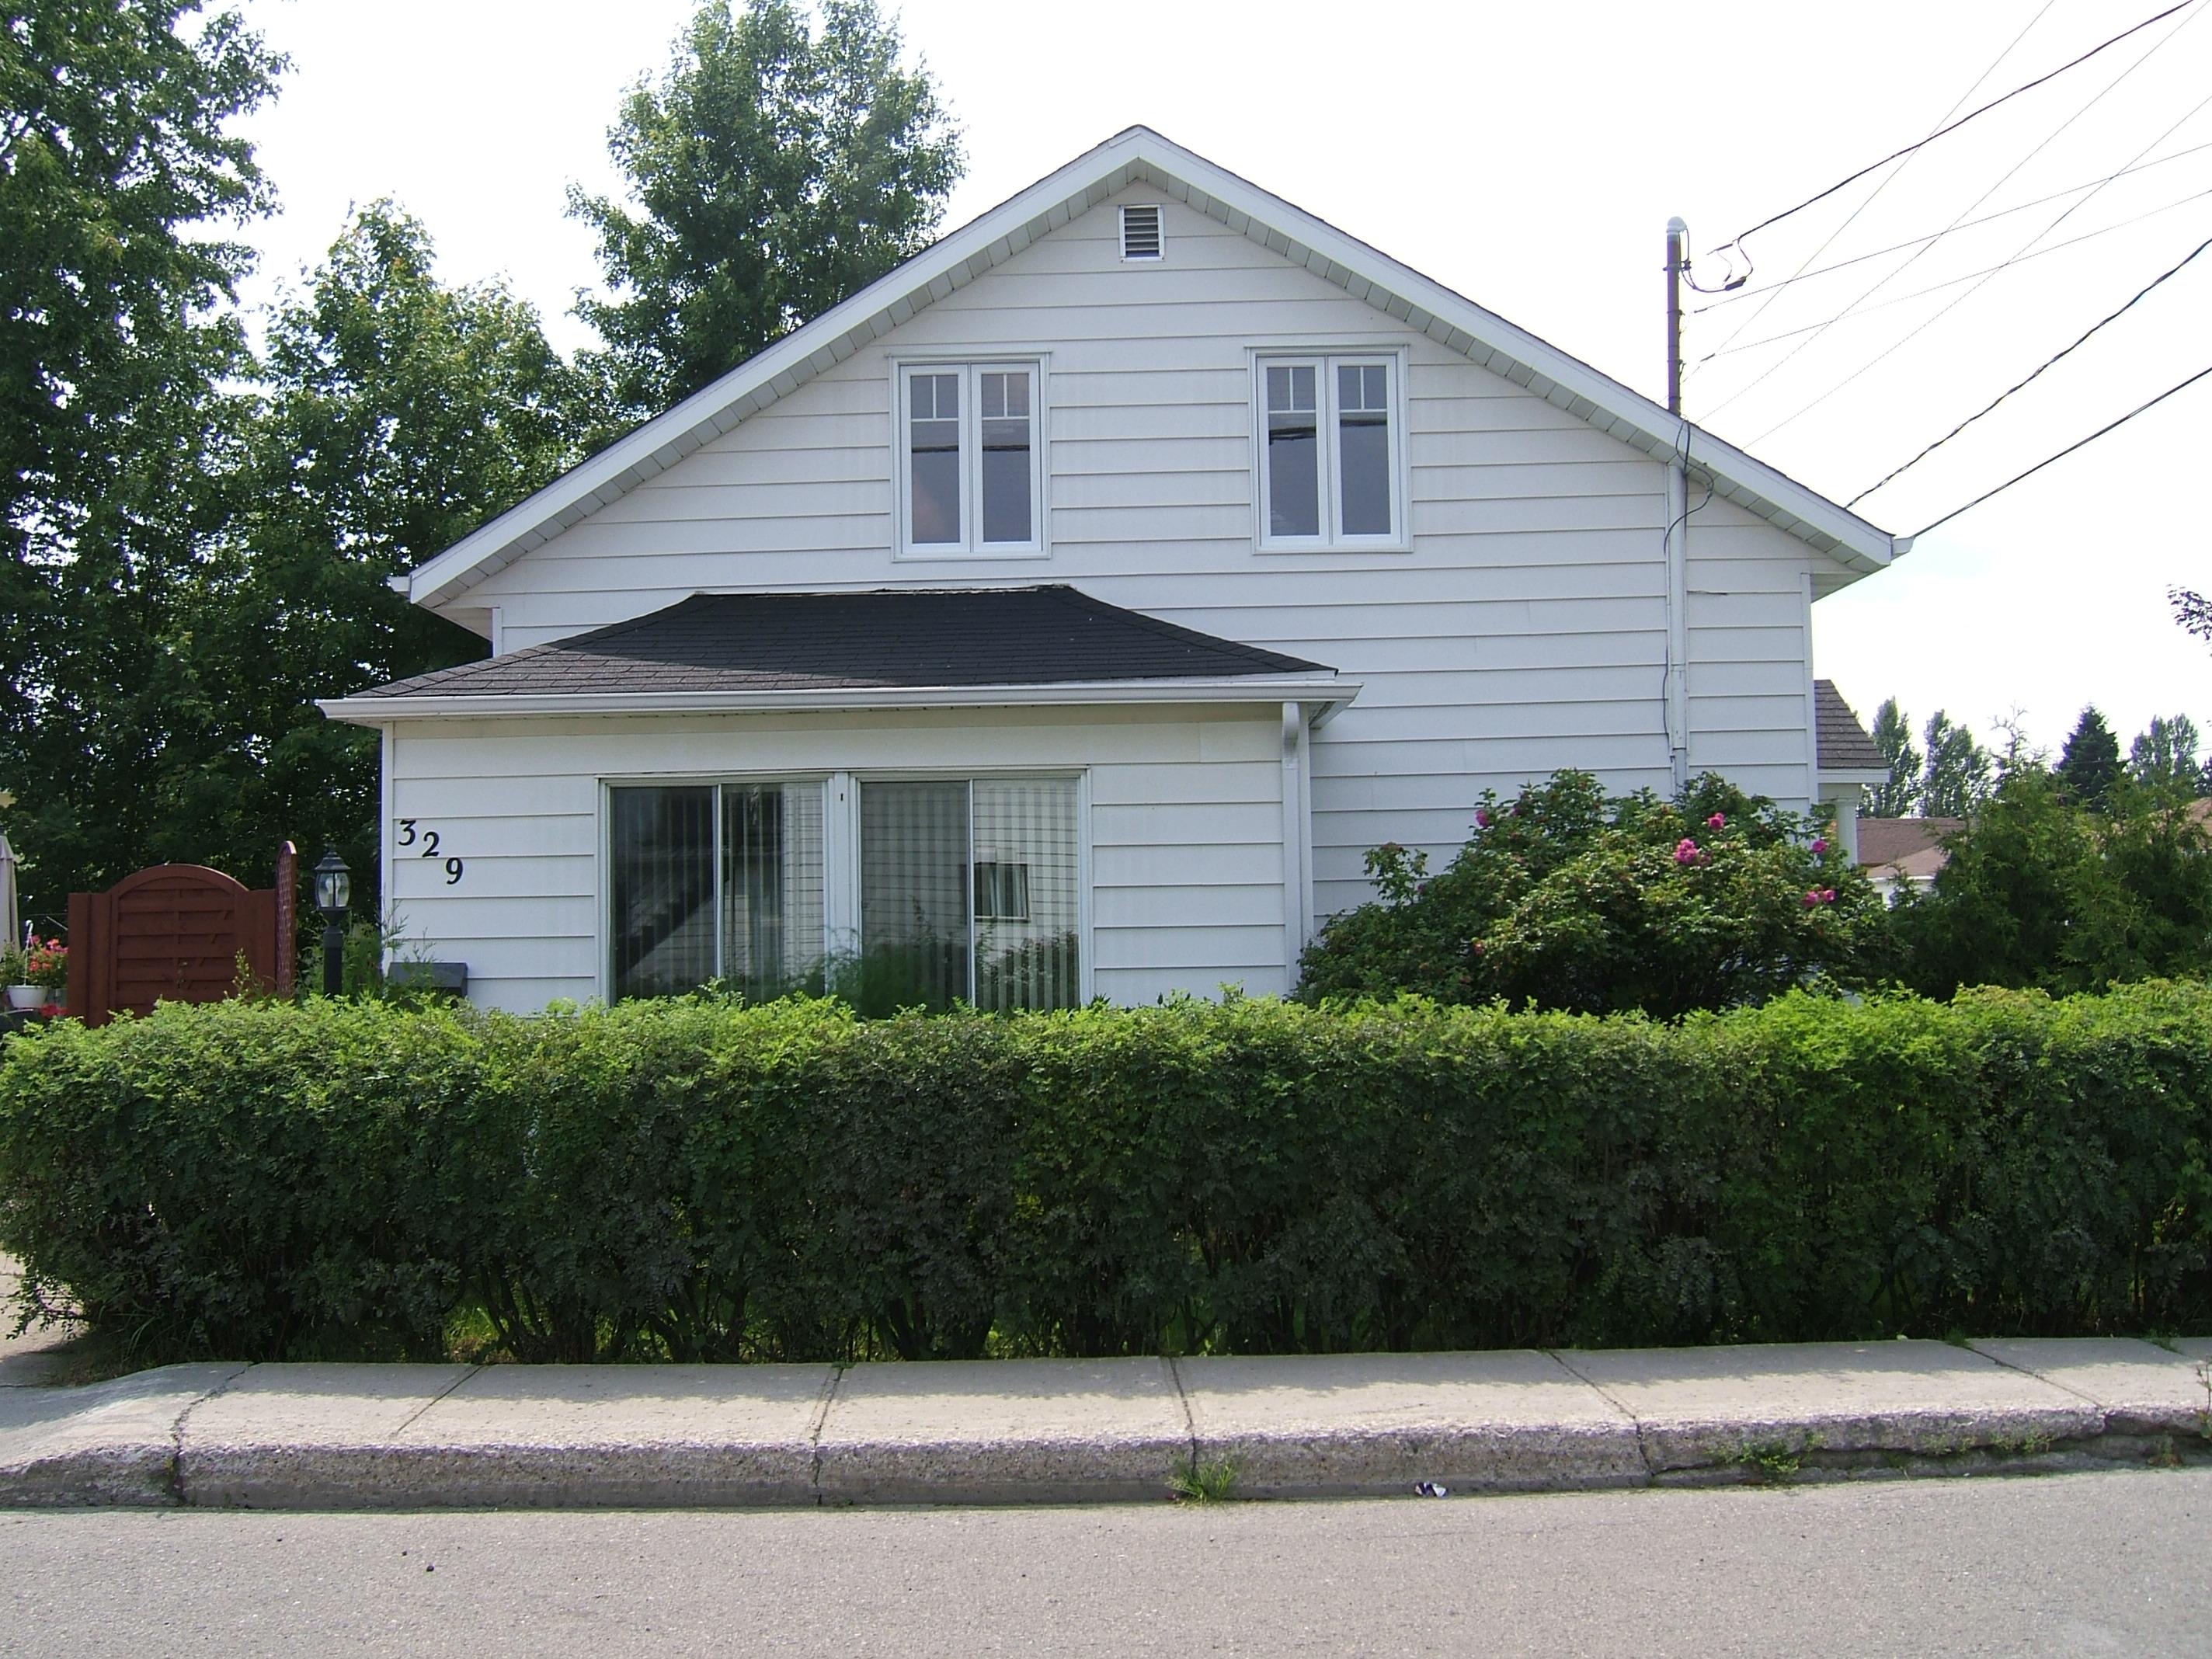 1597 - 329, avenue Sirois